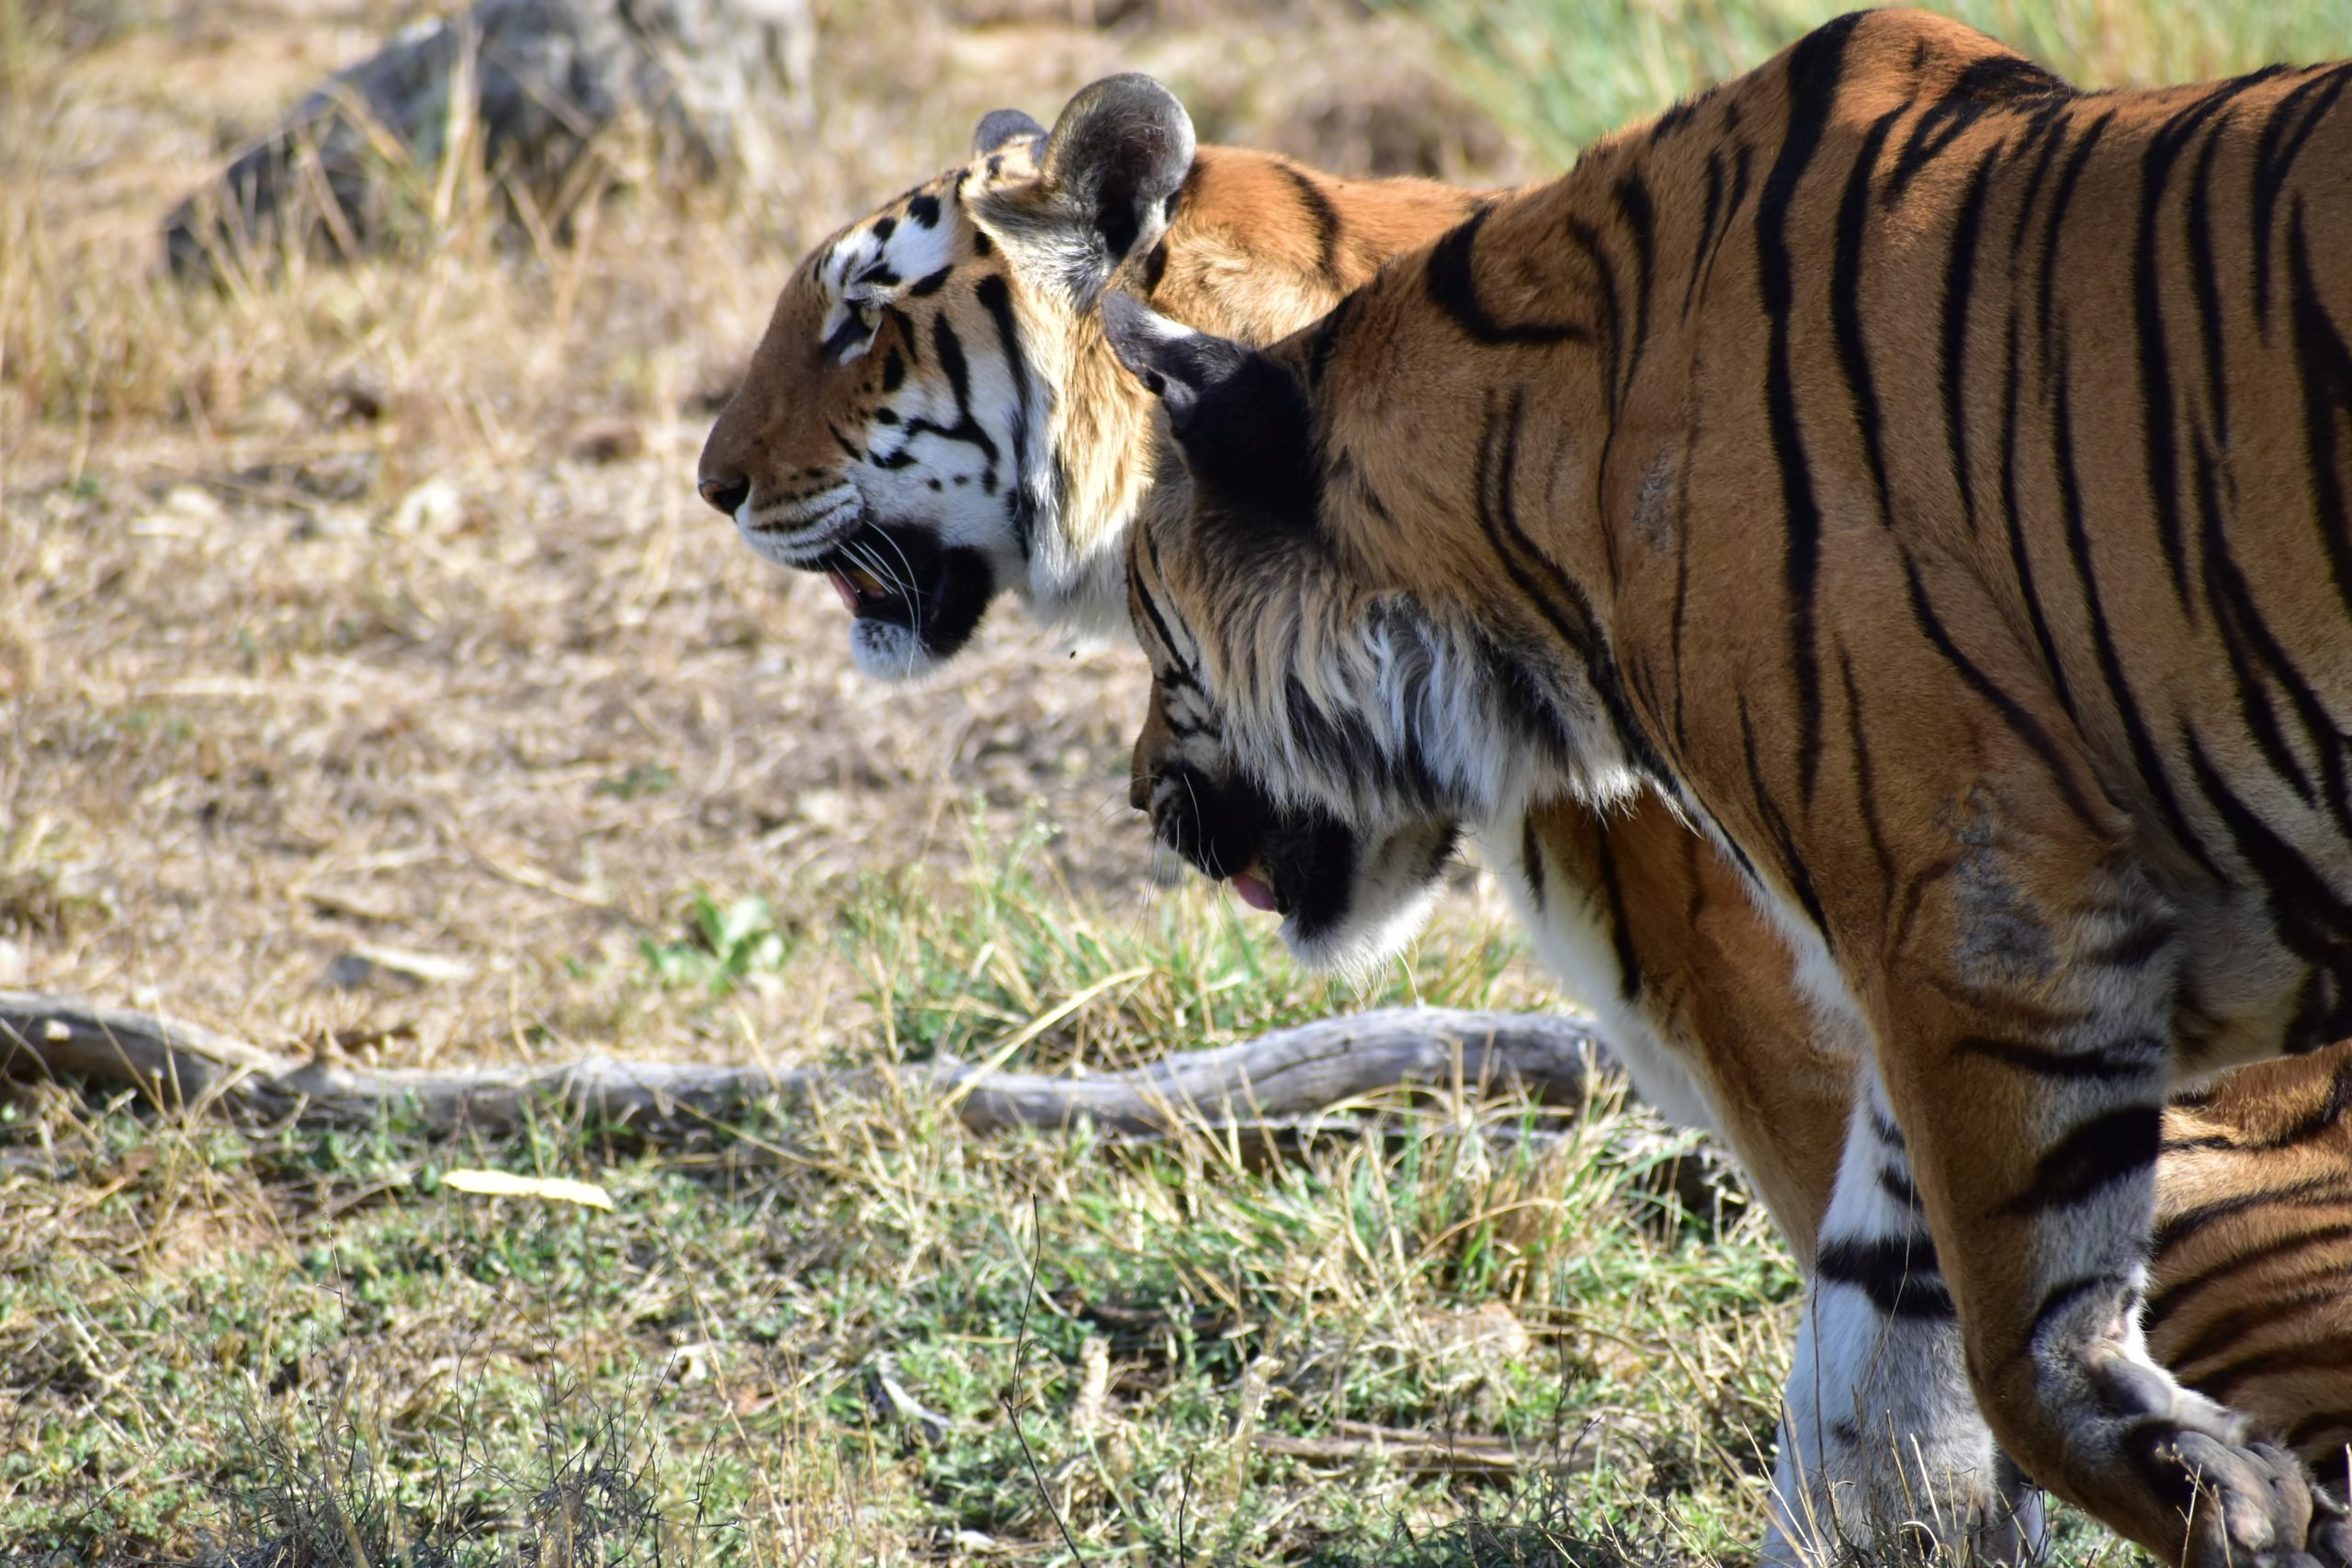 Tiger and tigress in jungle